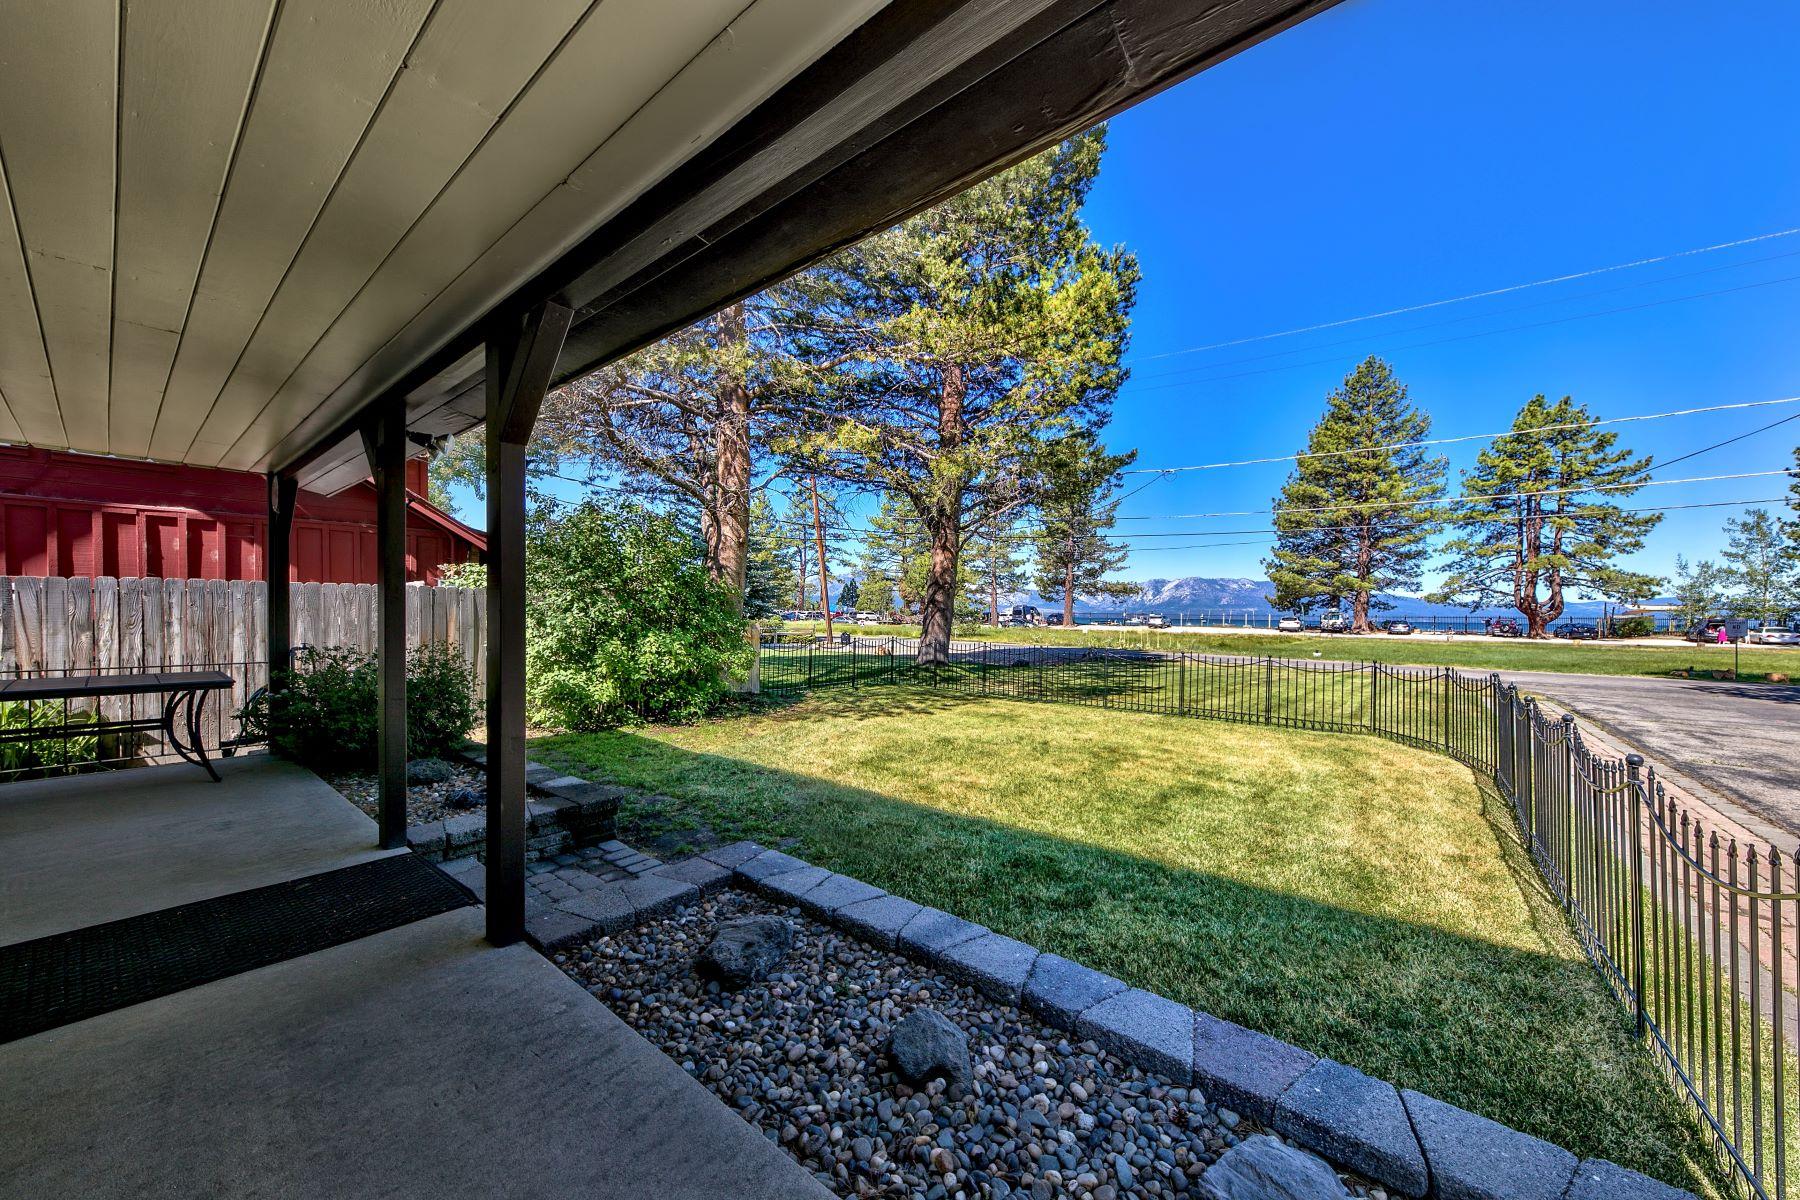 Additional photo for property listing at Lakefront Property 4068/4067 Sunrise Lane South Lake Tahoe, California 96150 United States